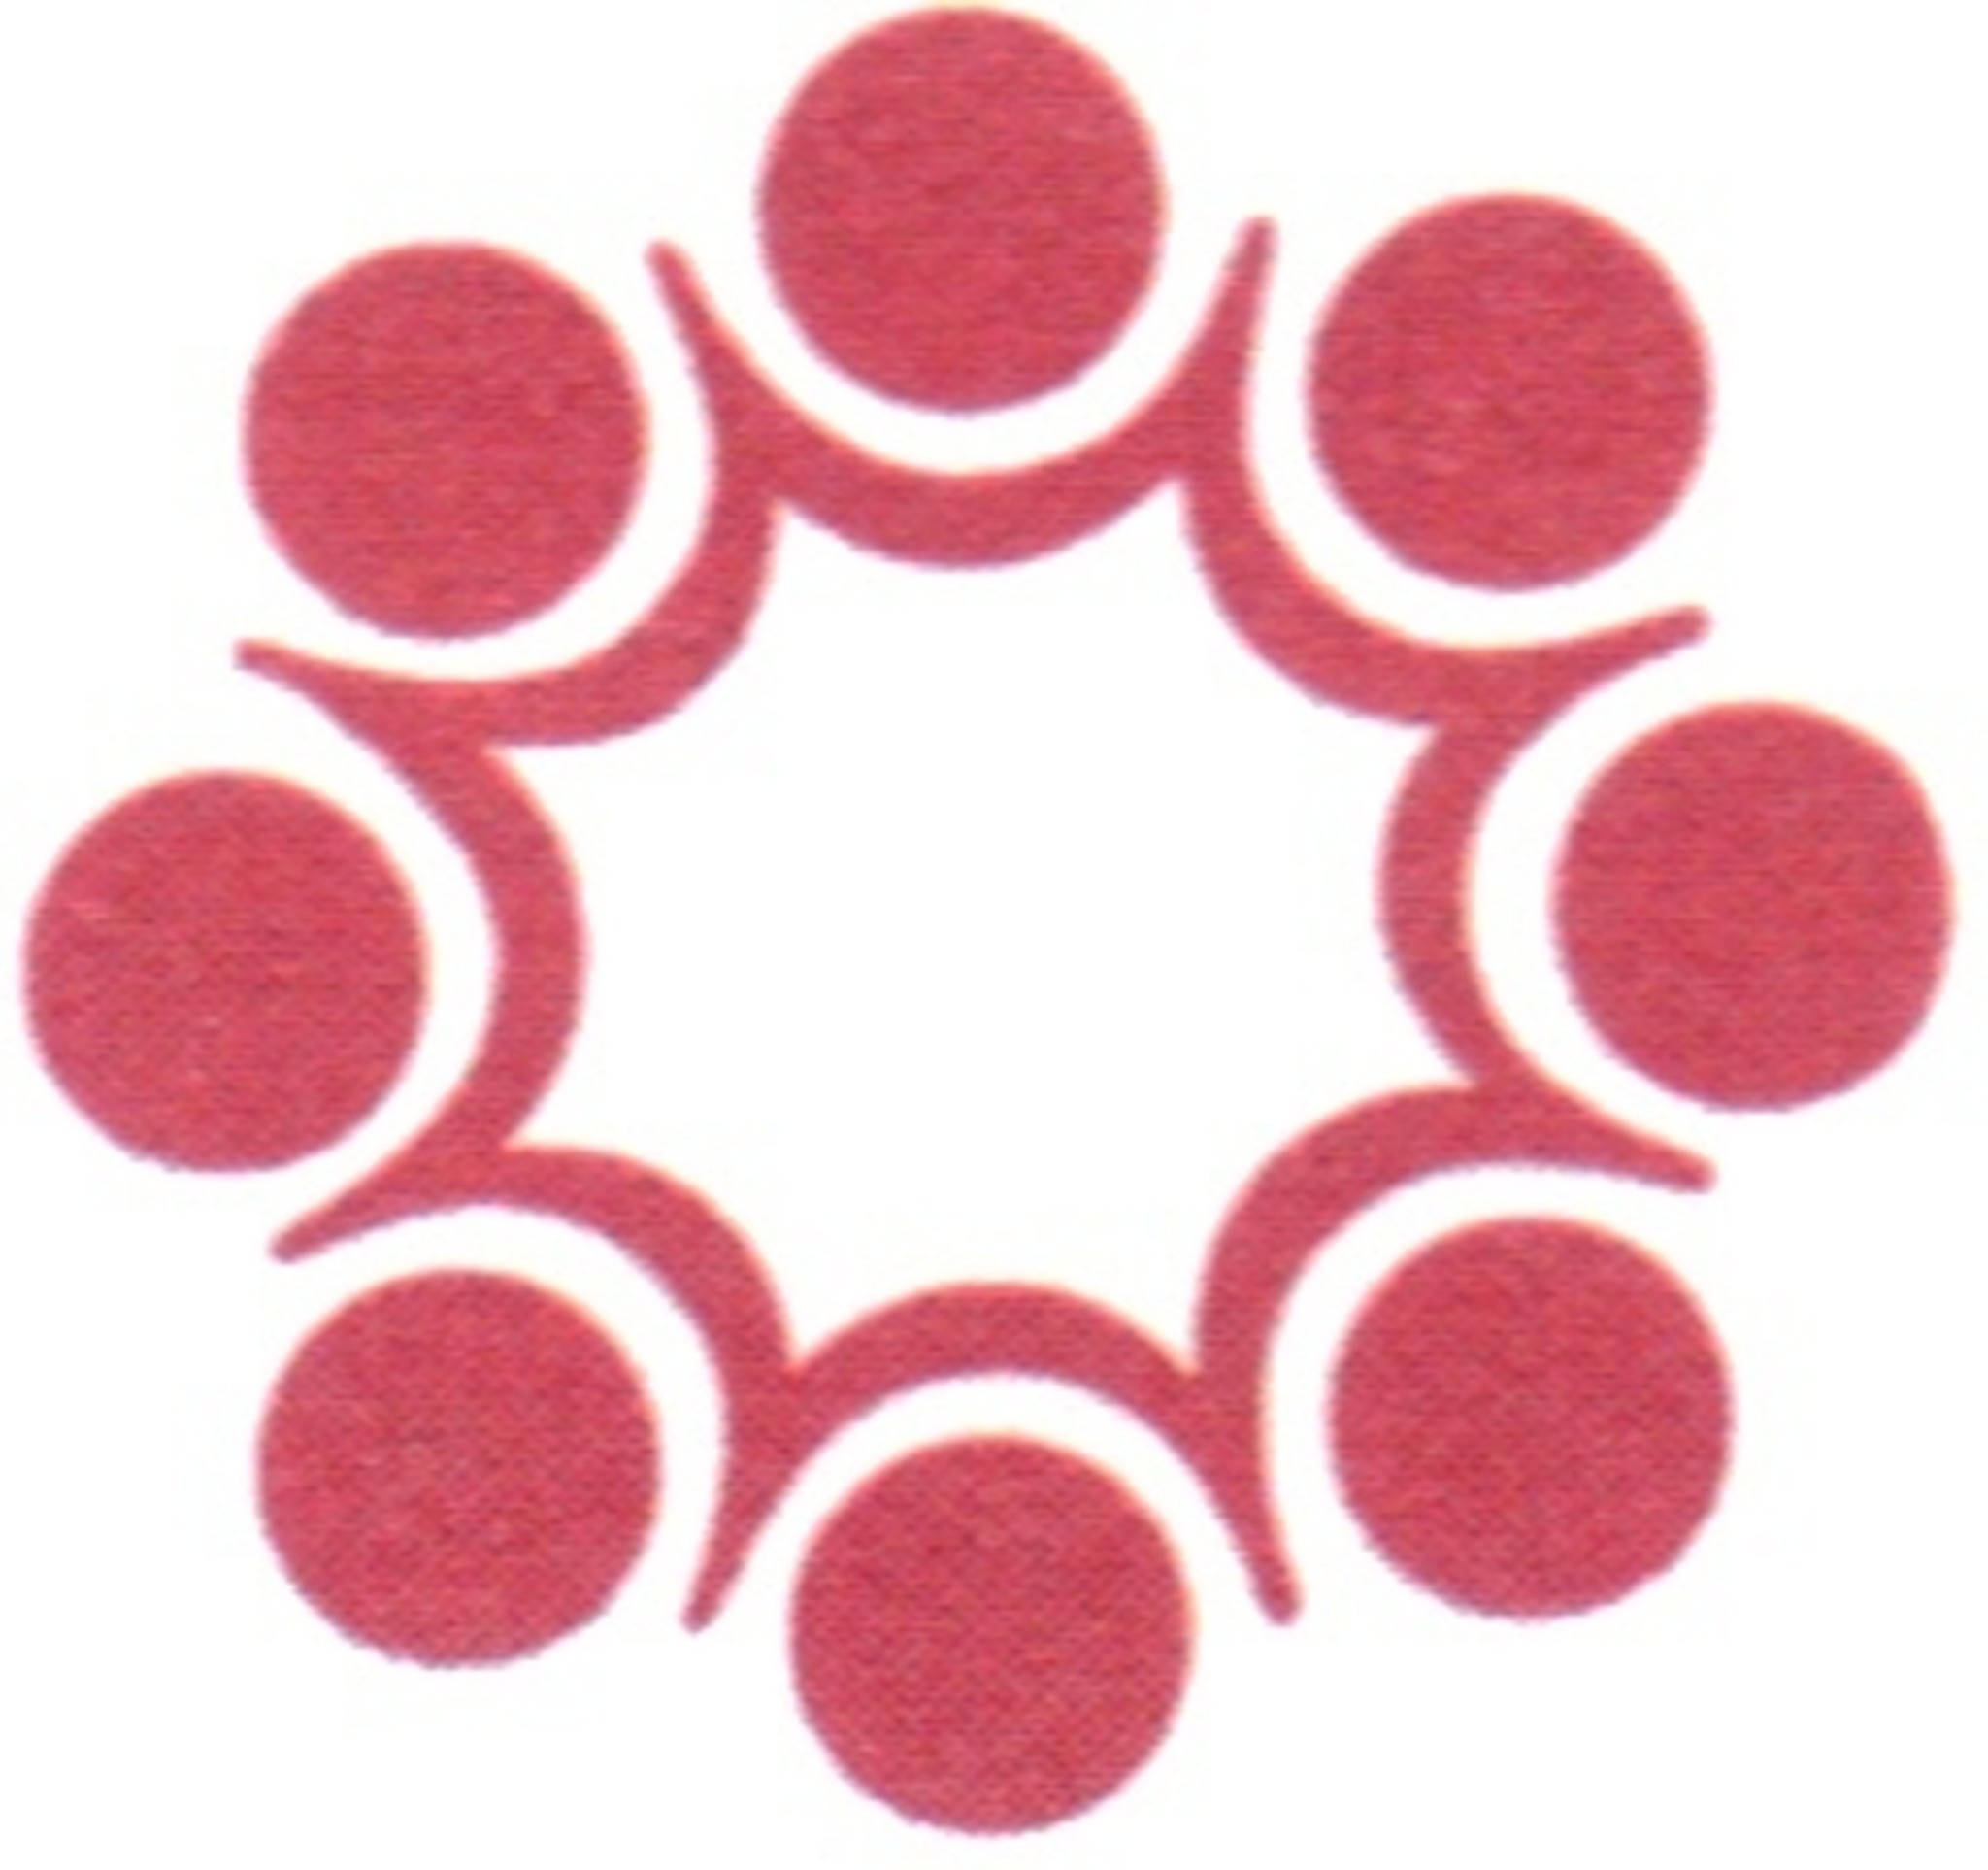 frhstcks-treffen fr frauen - Purkersdorf - intertecinc.com